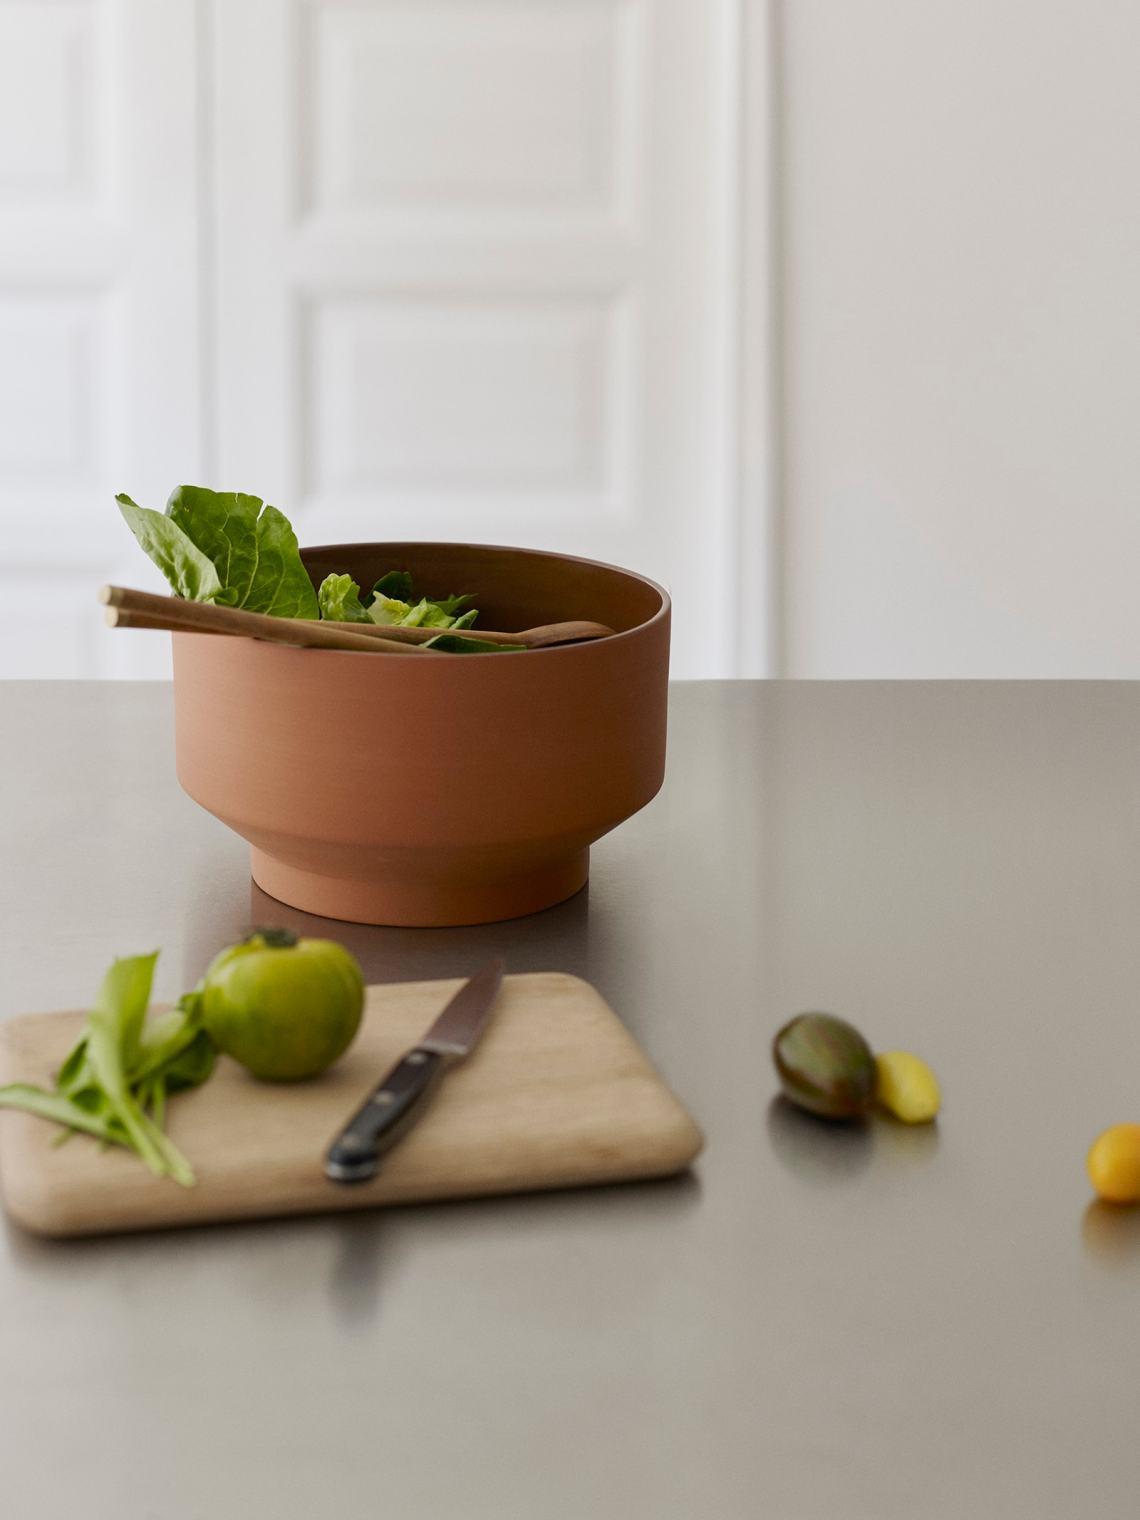 Edge bowls by Skagerak